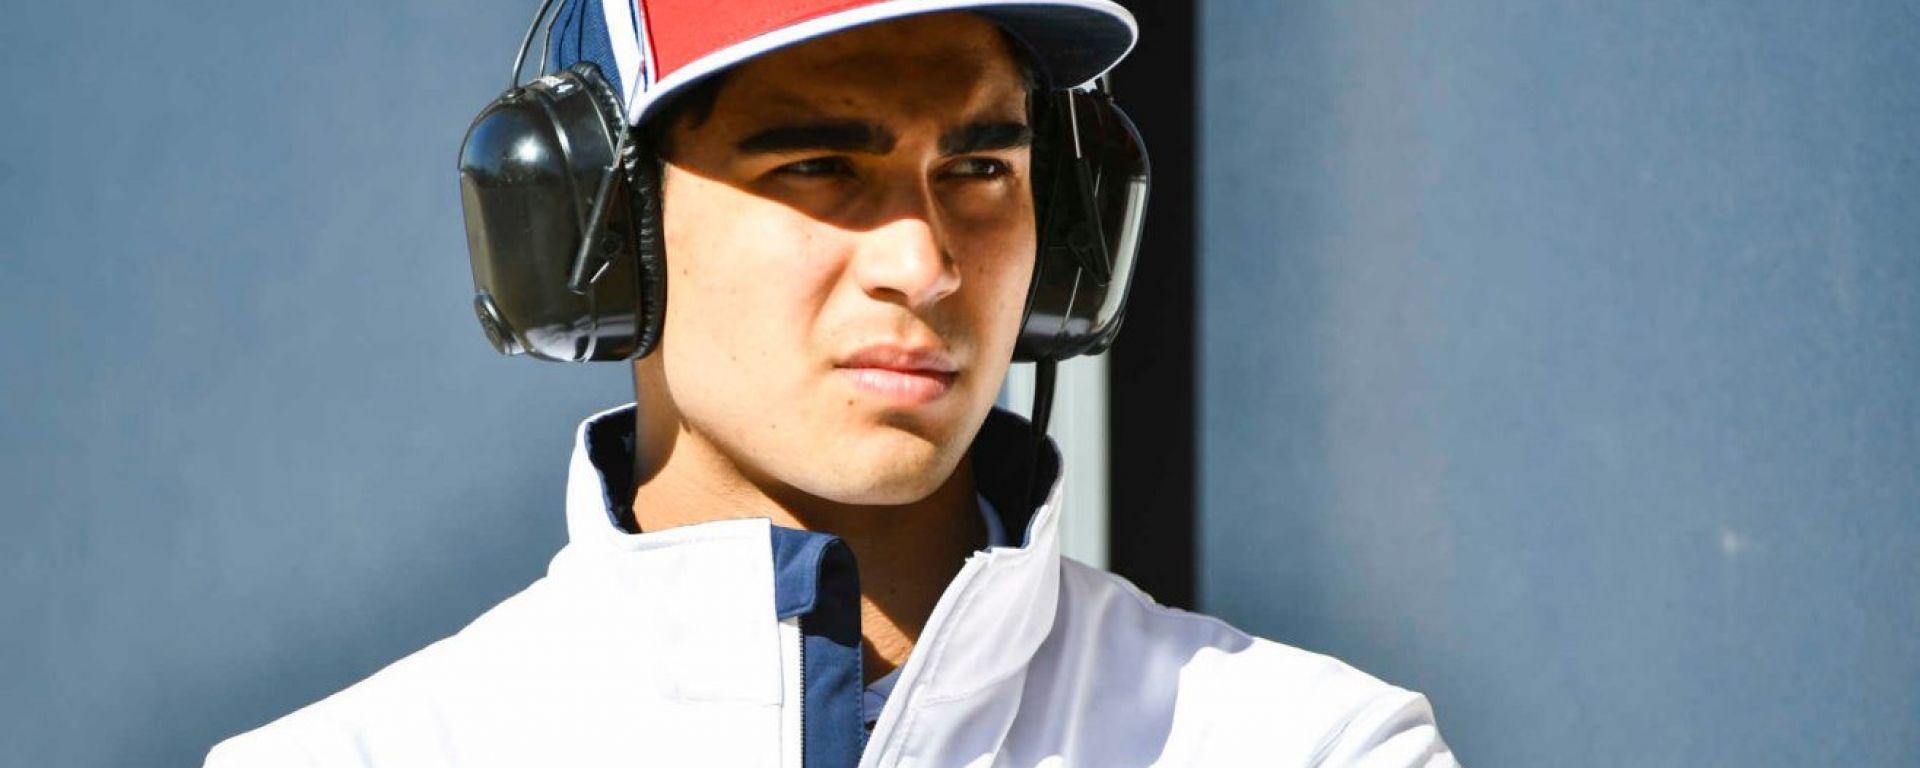 Juan Manuel Correa (Sauber Junior Team)